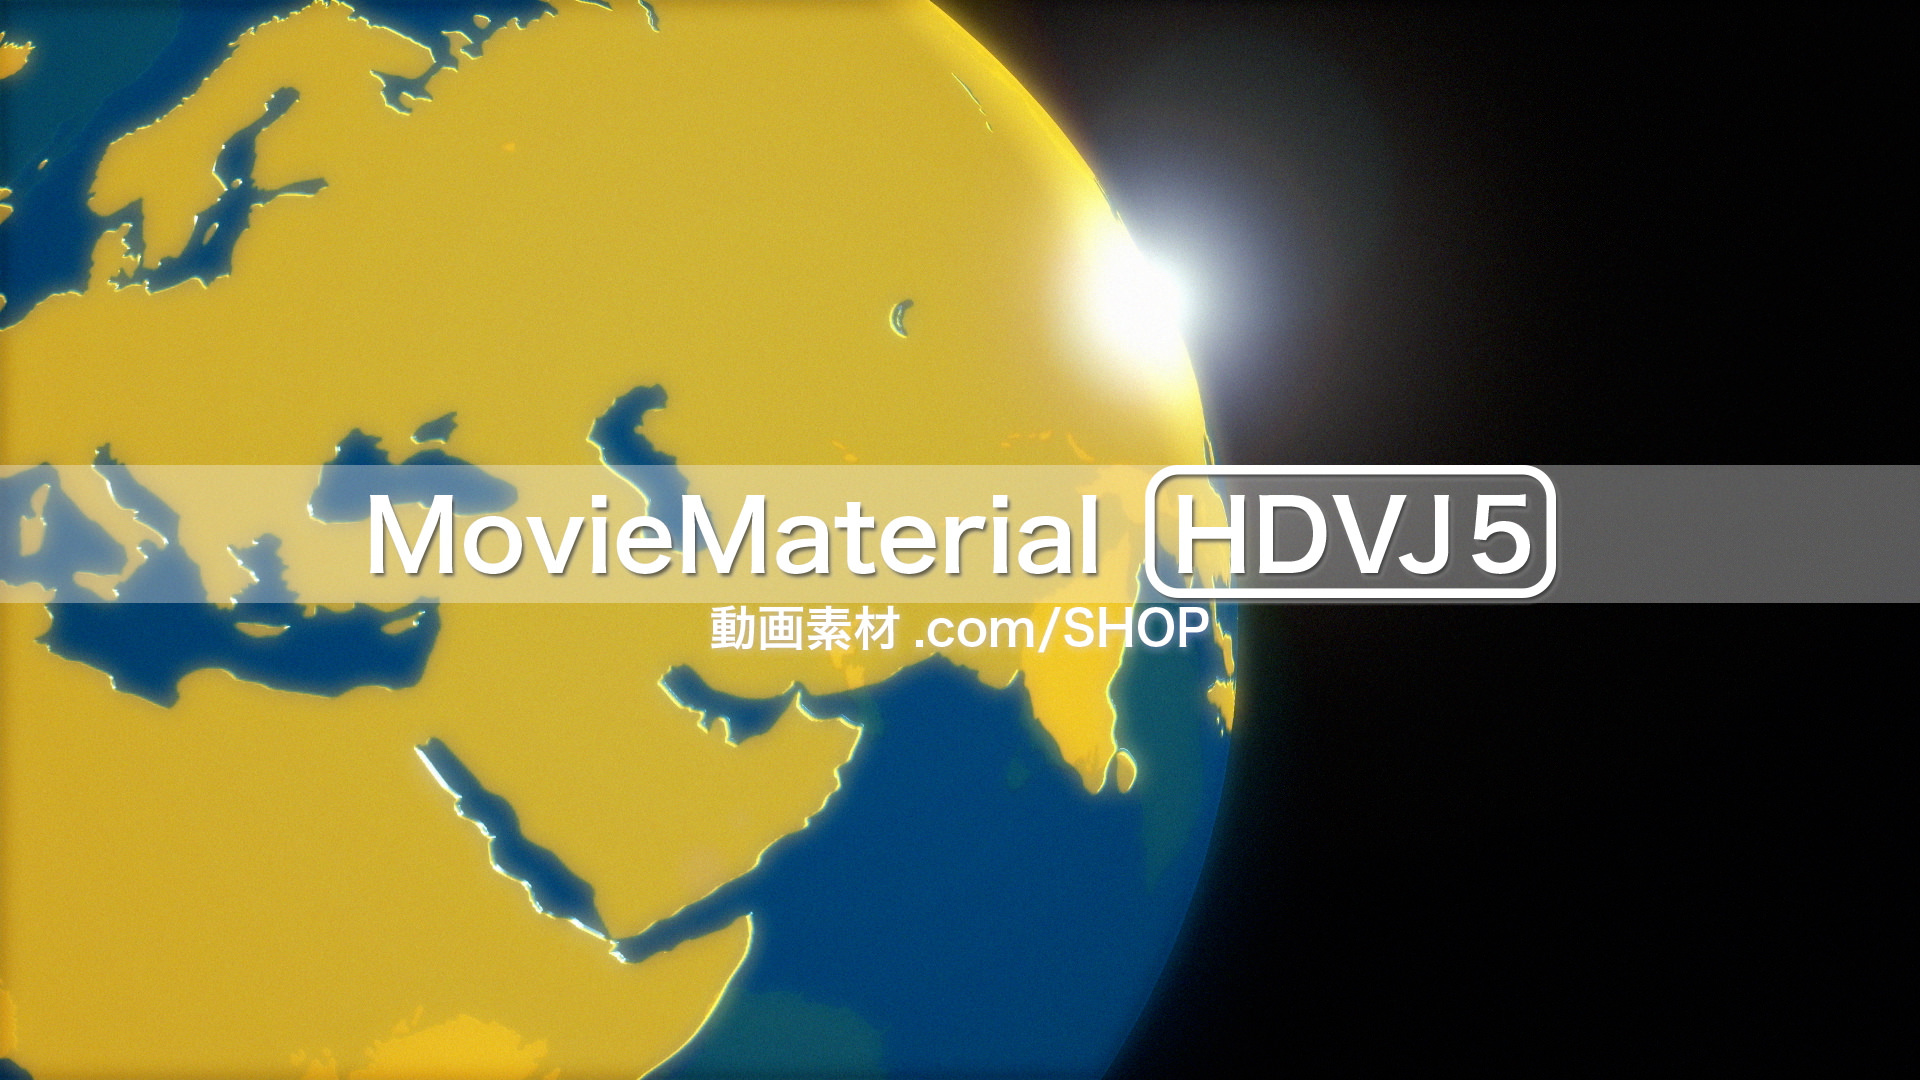 MovieMaterial HDVJ5 フルハイビジョンVJ動画素材集 画像5